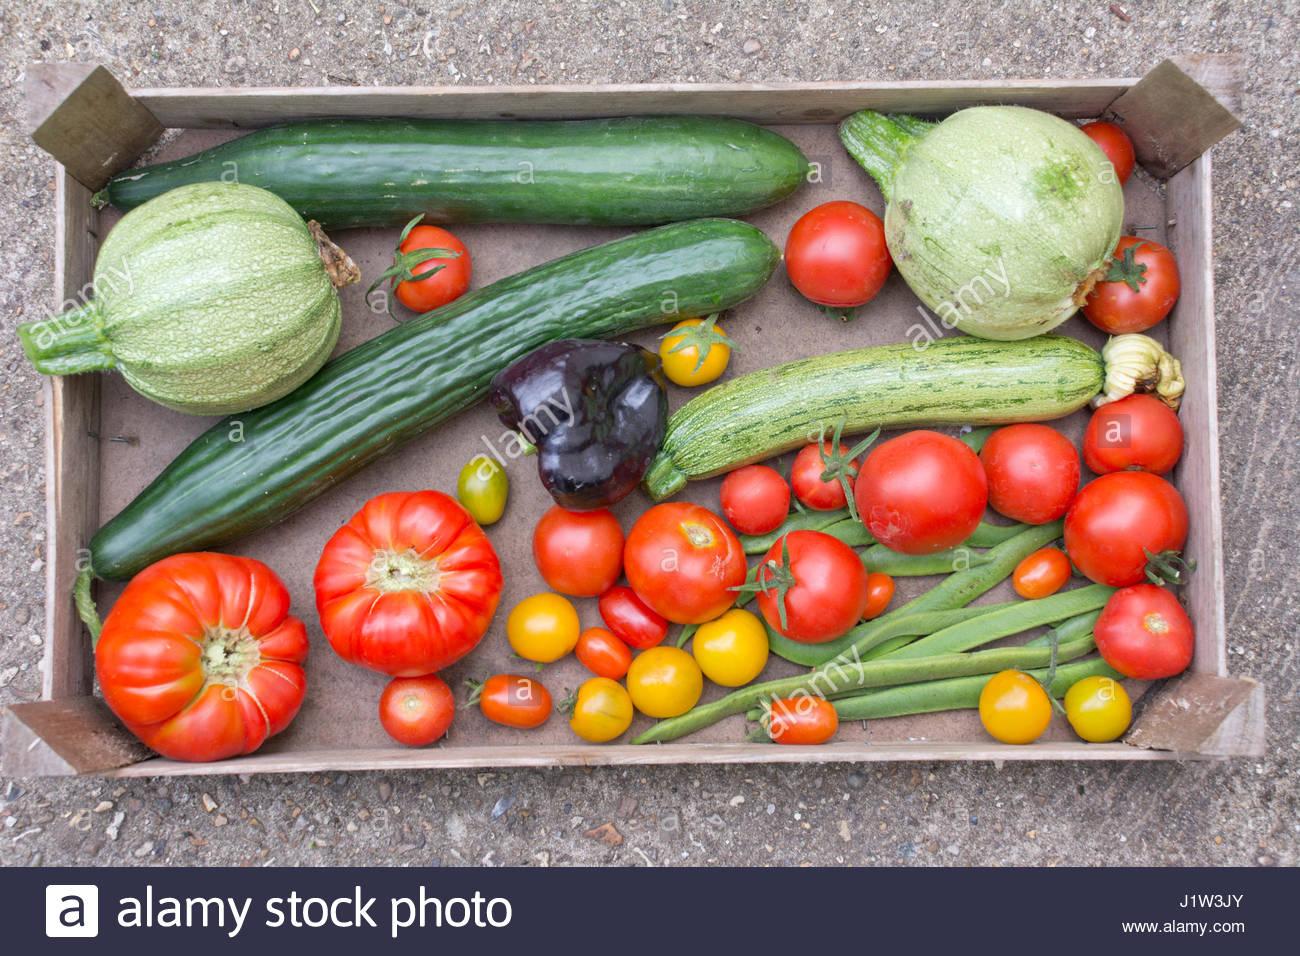 ALLOTMENT HARVESTED VEGETABLES - Stock Image